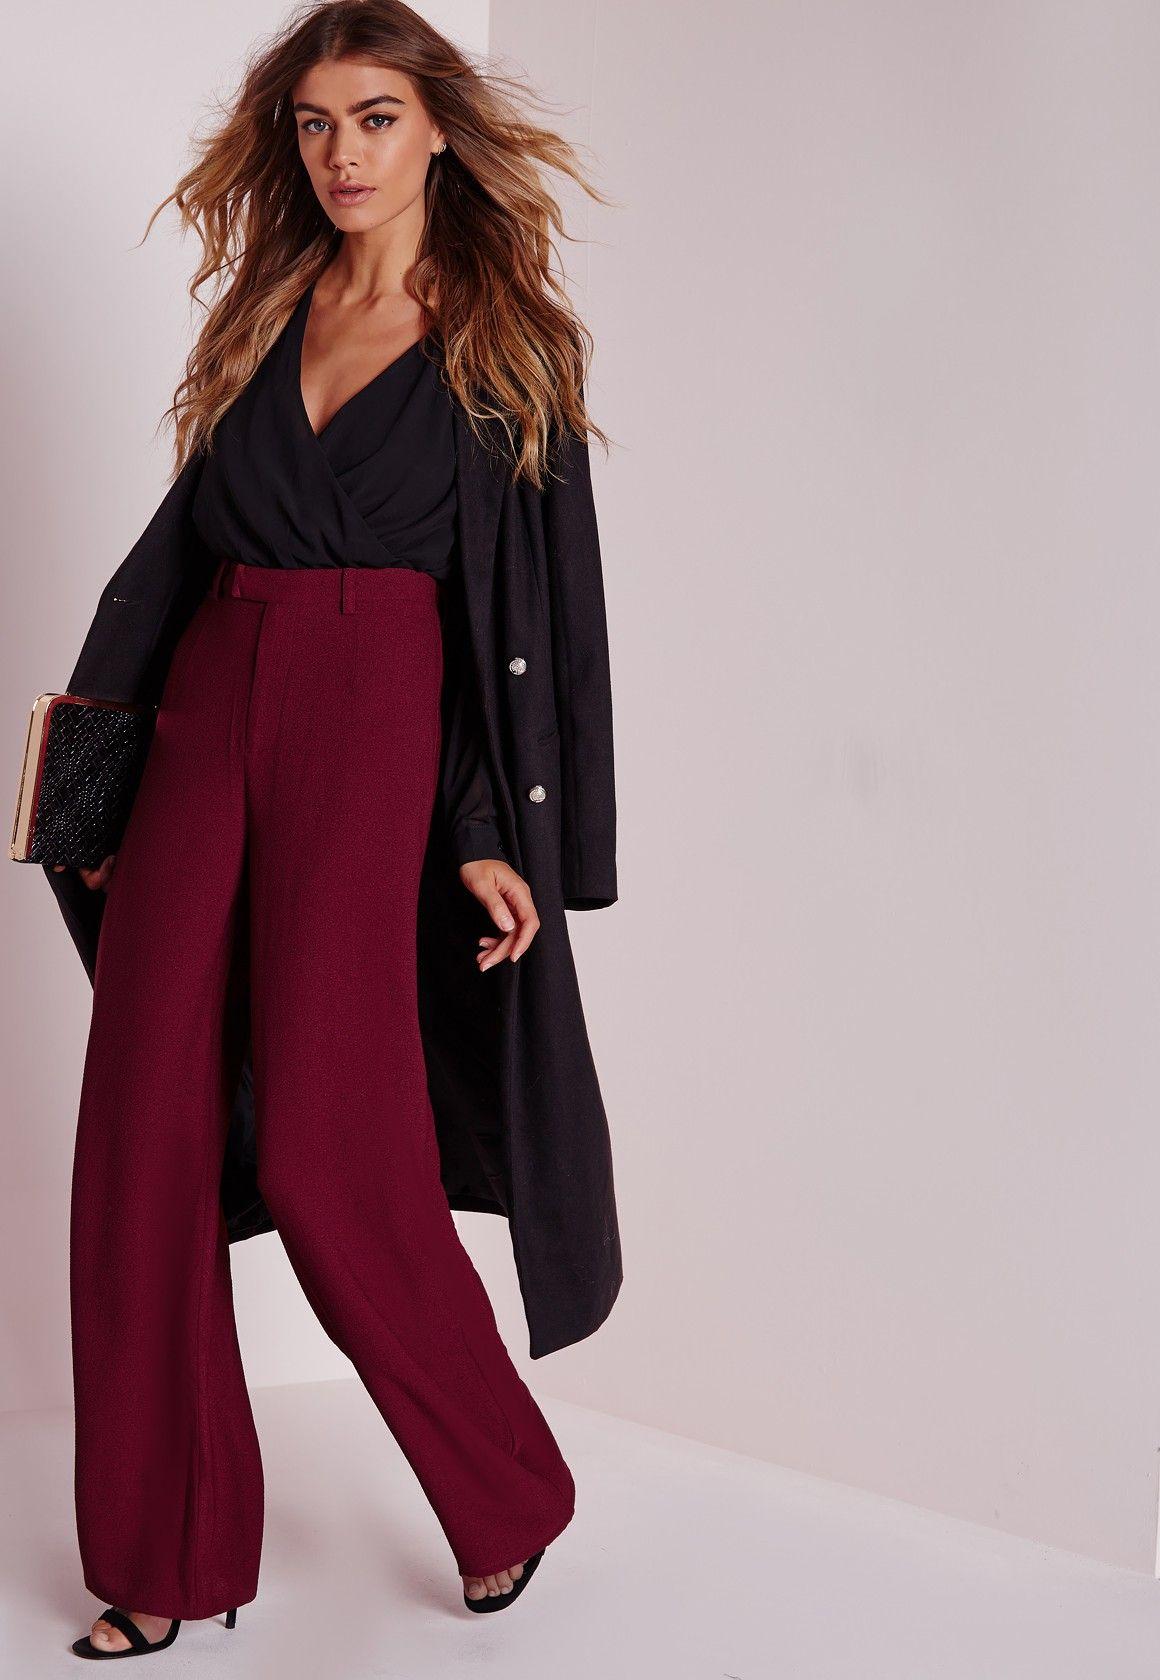 5b081bab491b Petite Premium Crepe Wide Leg Trousers Burgundy - Tall - Trousers -  Missguided